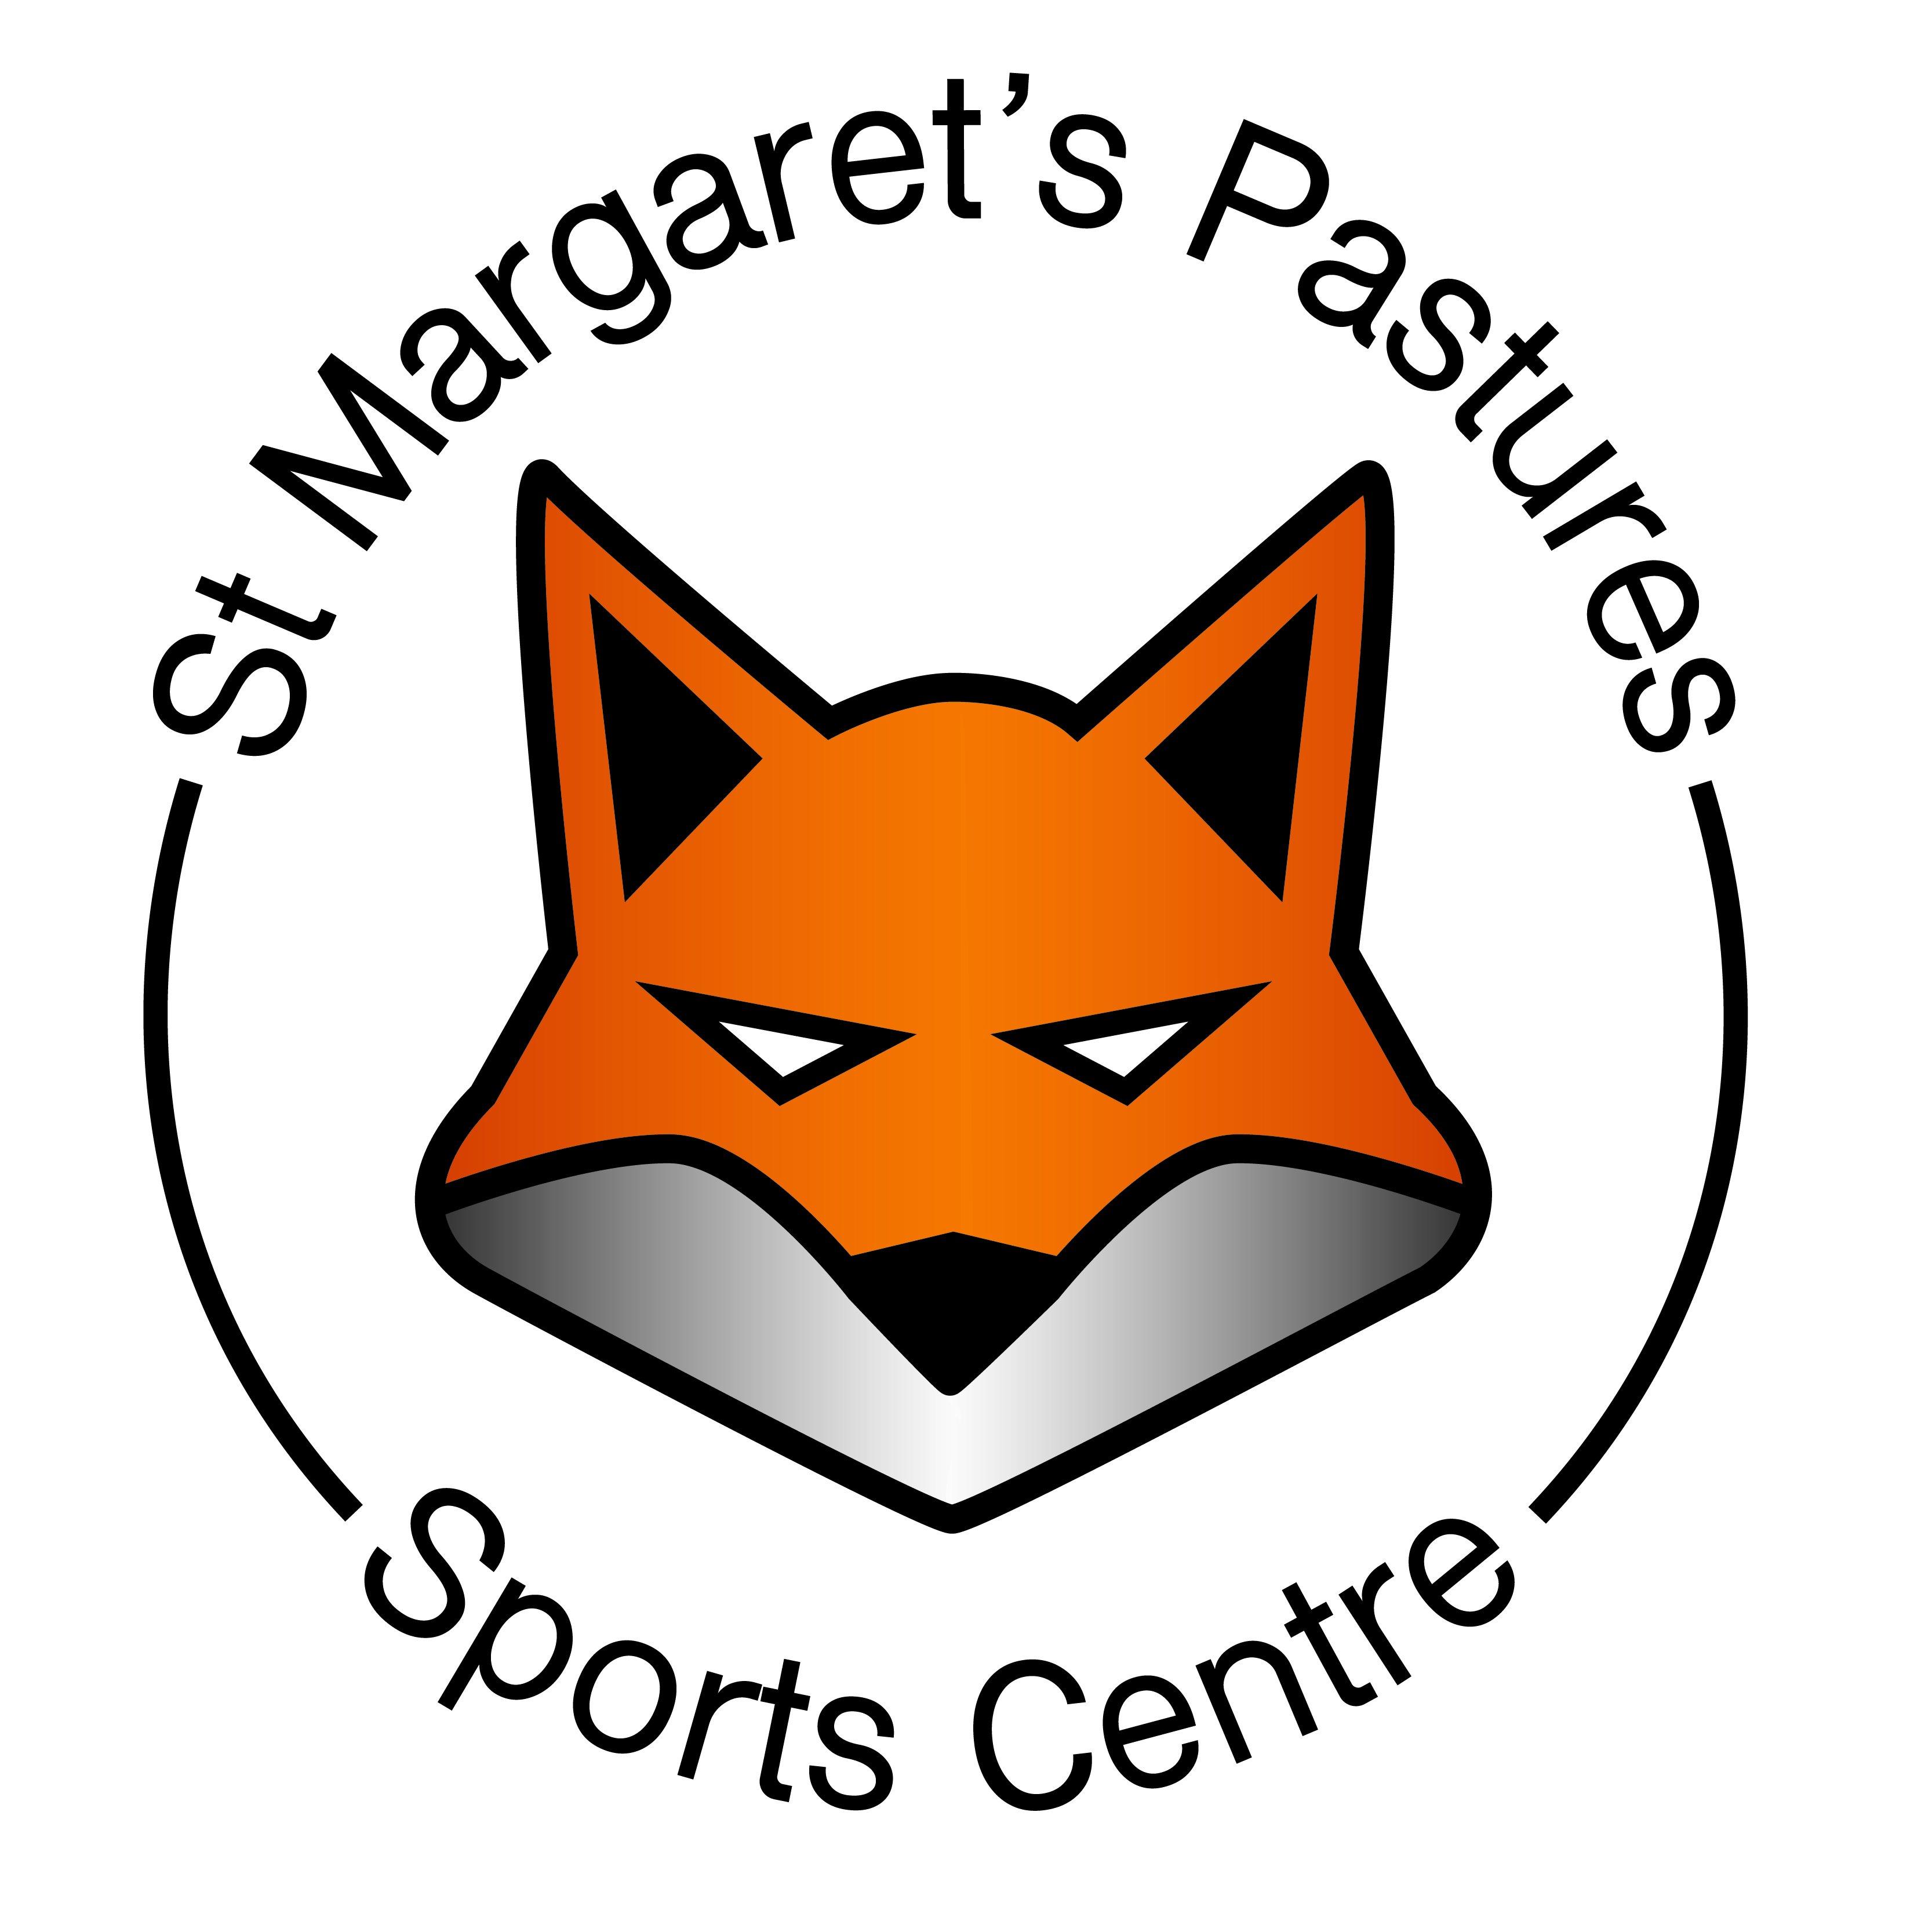 St Margaret's Pastures Sport Centre